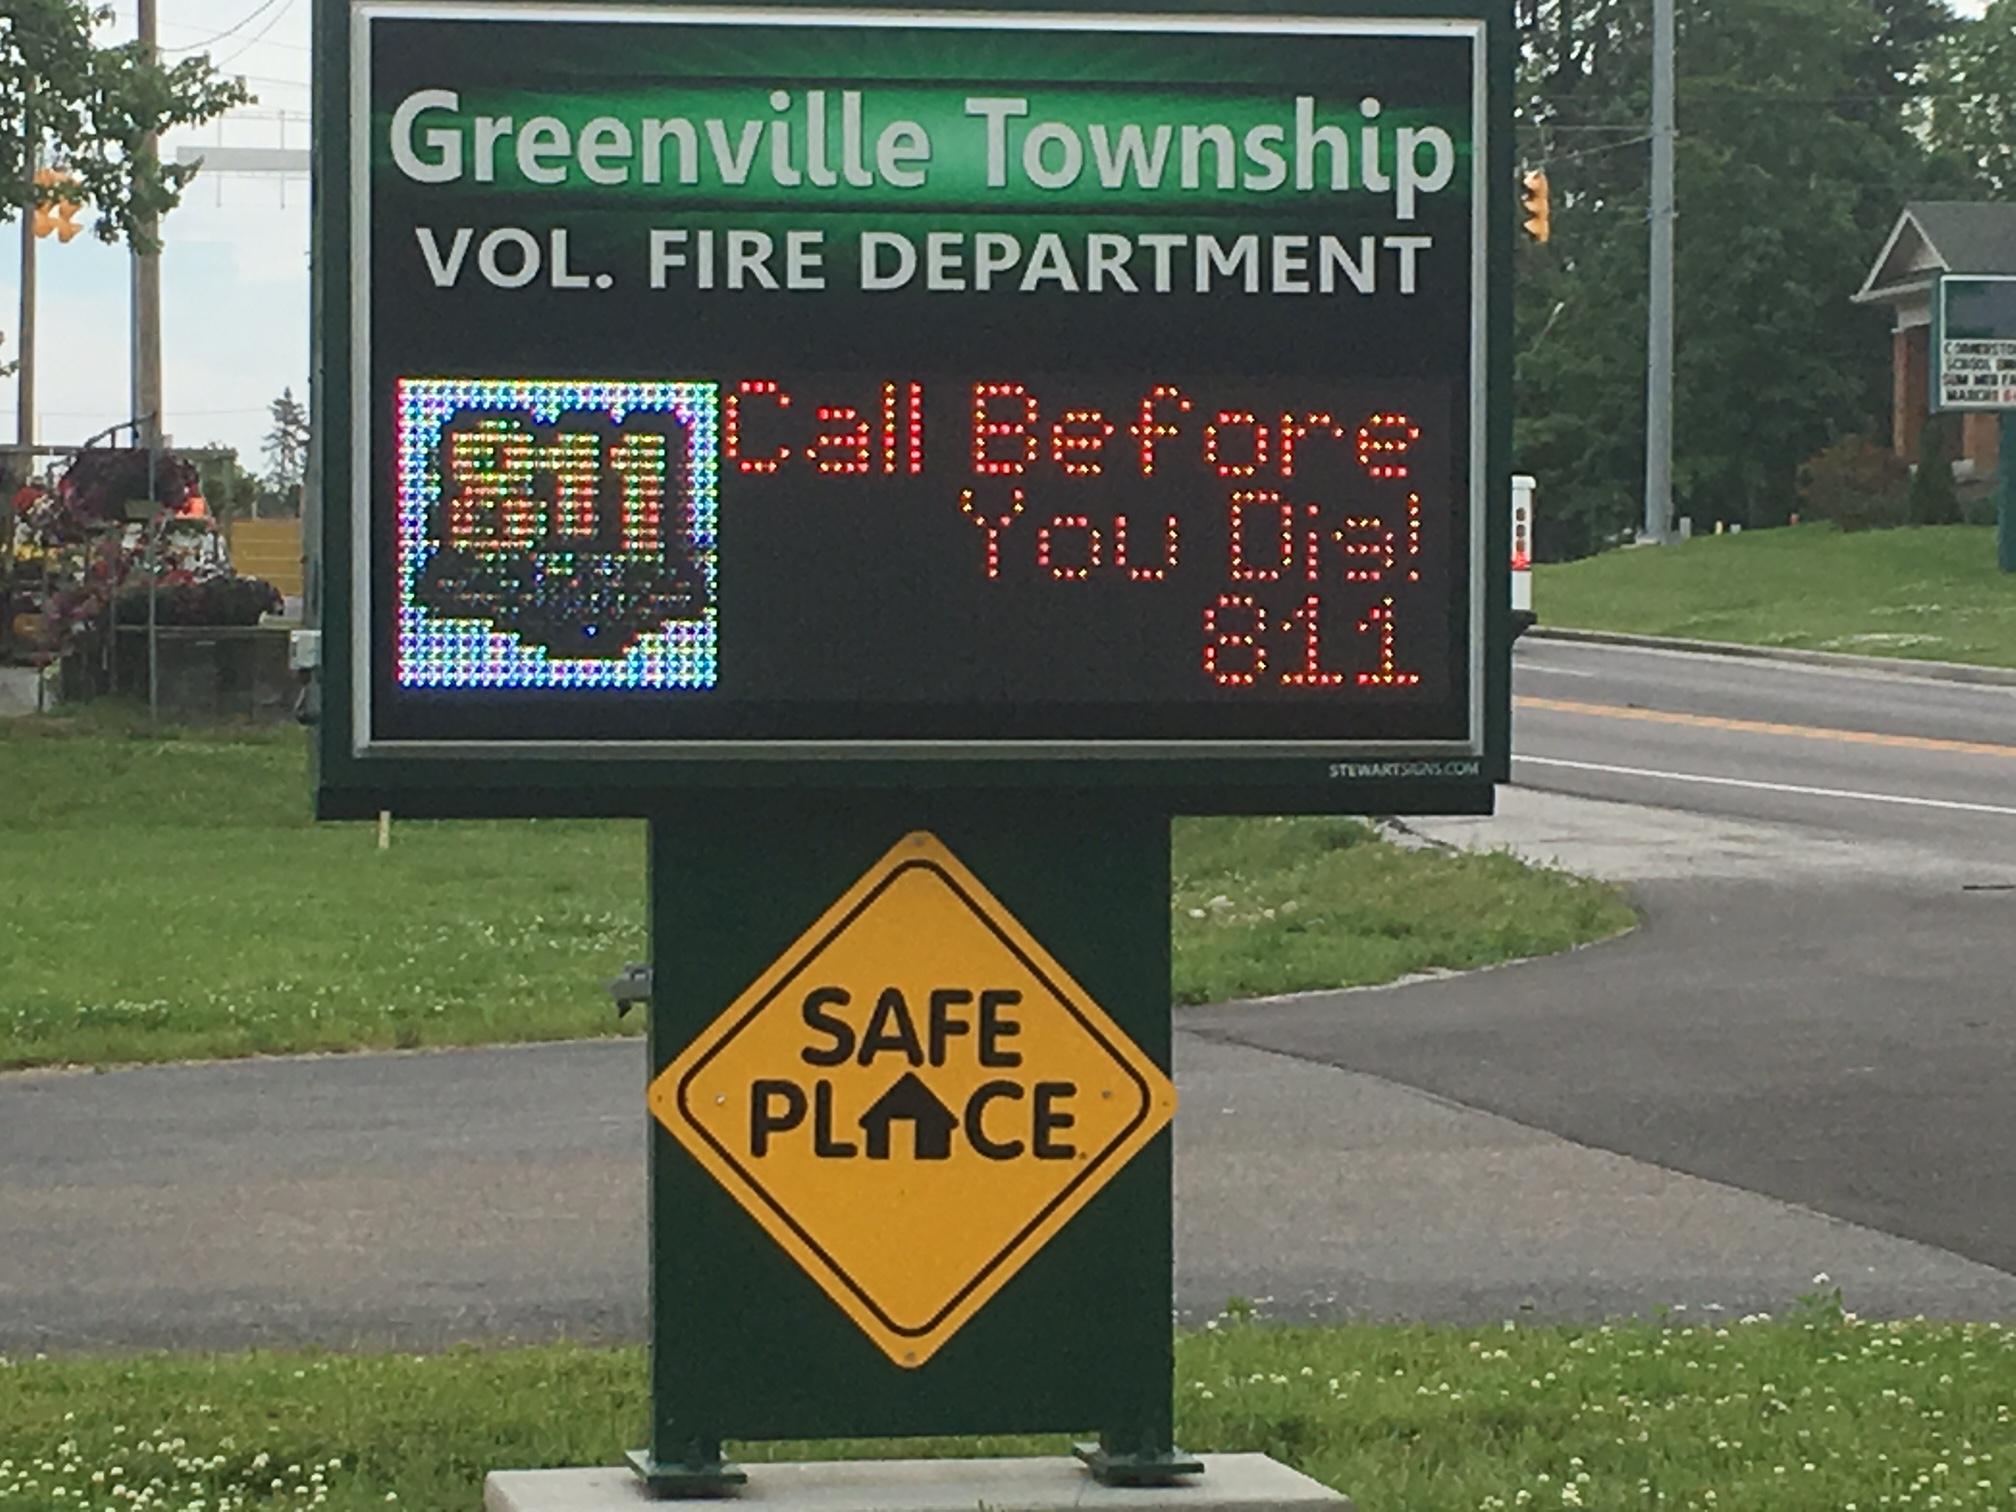 Greenville Township Vol. Fire Department